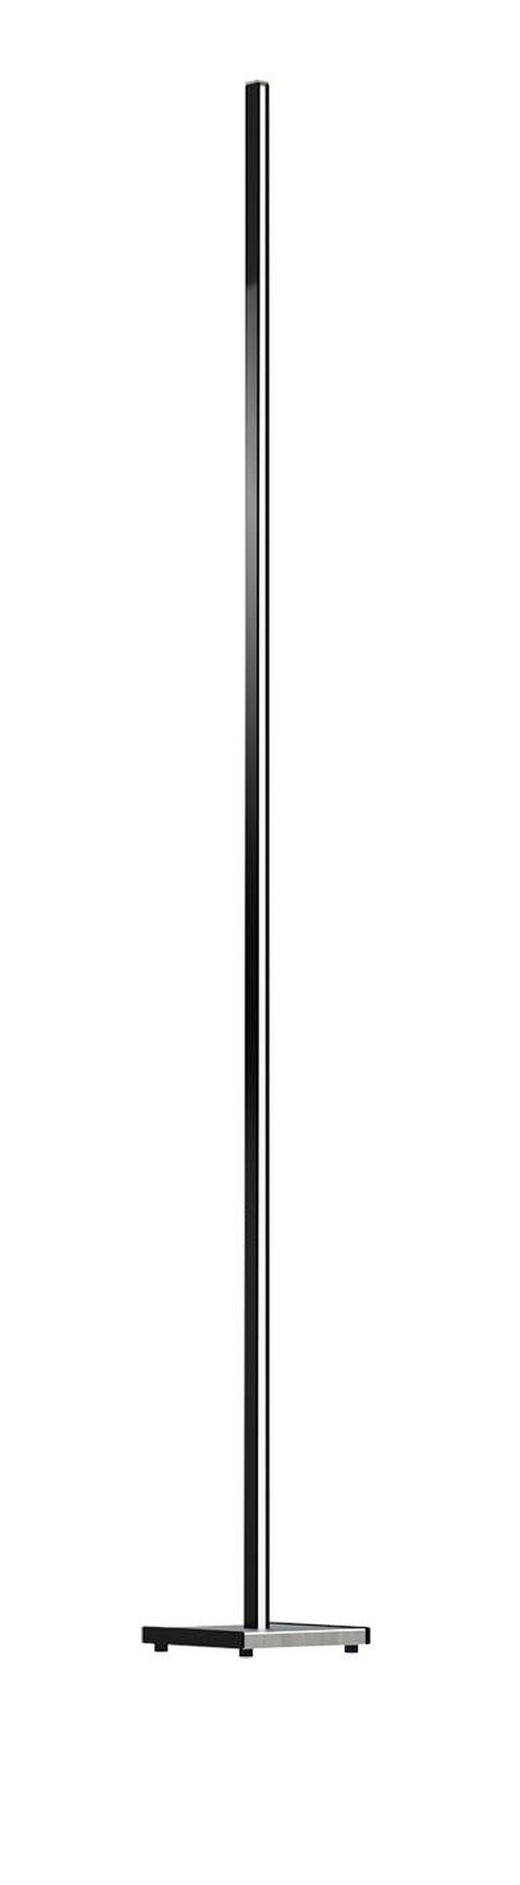 LED-STEHLEUCHTE - Schwarz, Design, Kunststoff/Metall (2,3/180/2cm)